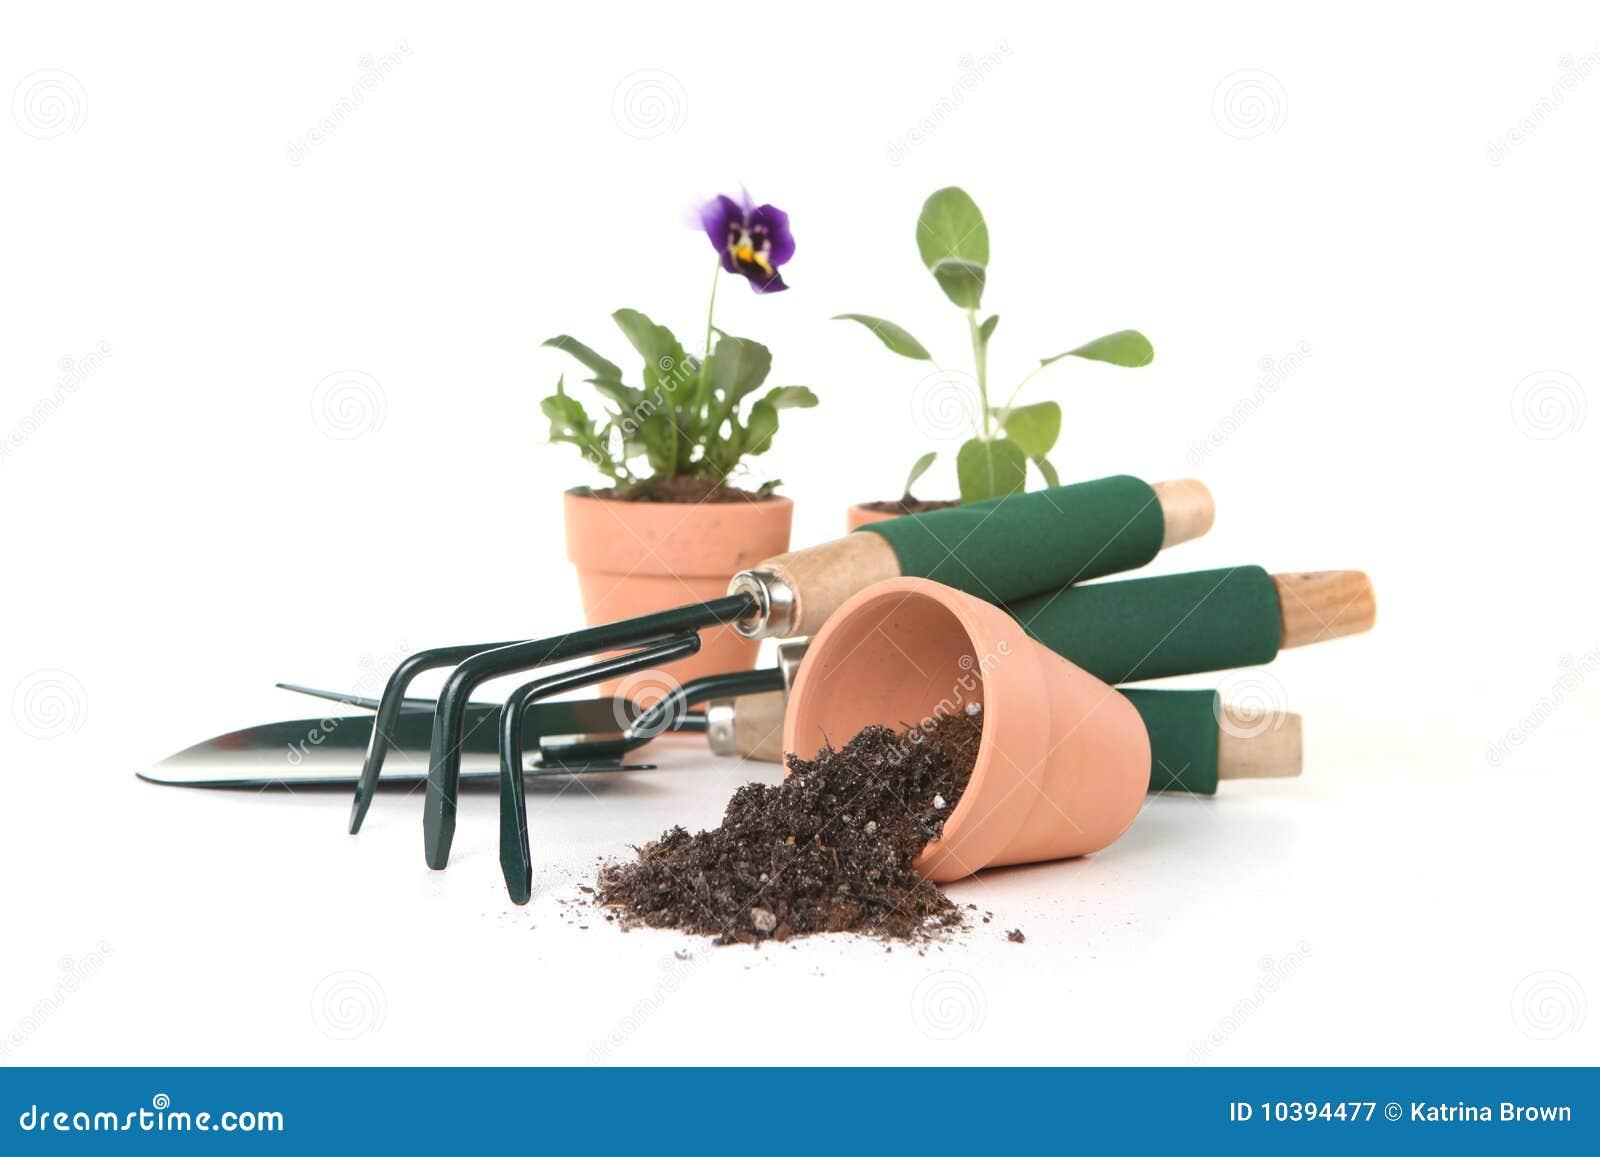 Gardening Tools On White Background Royalty Free Stock